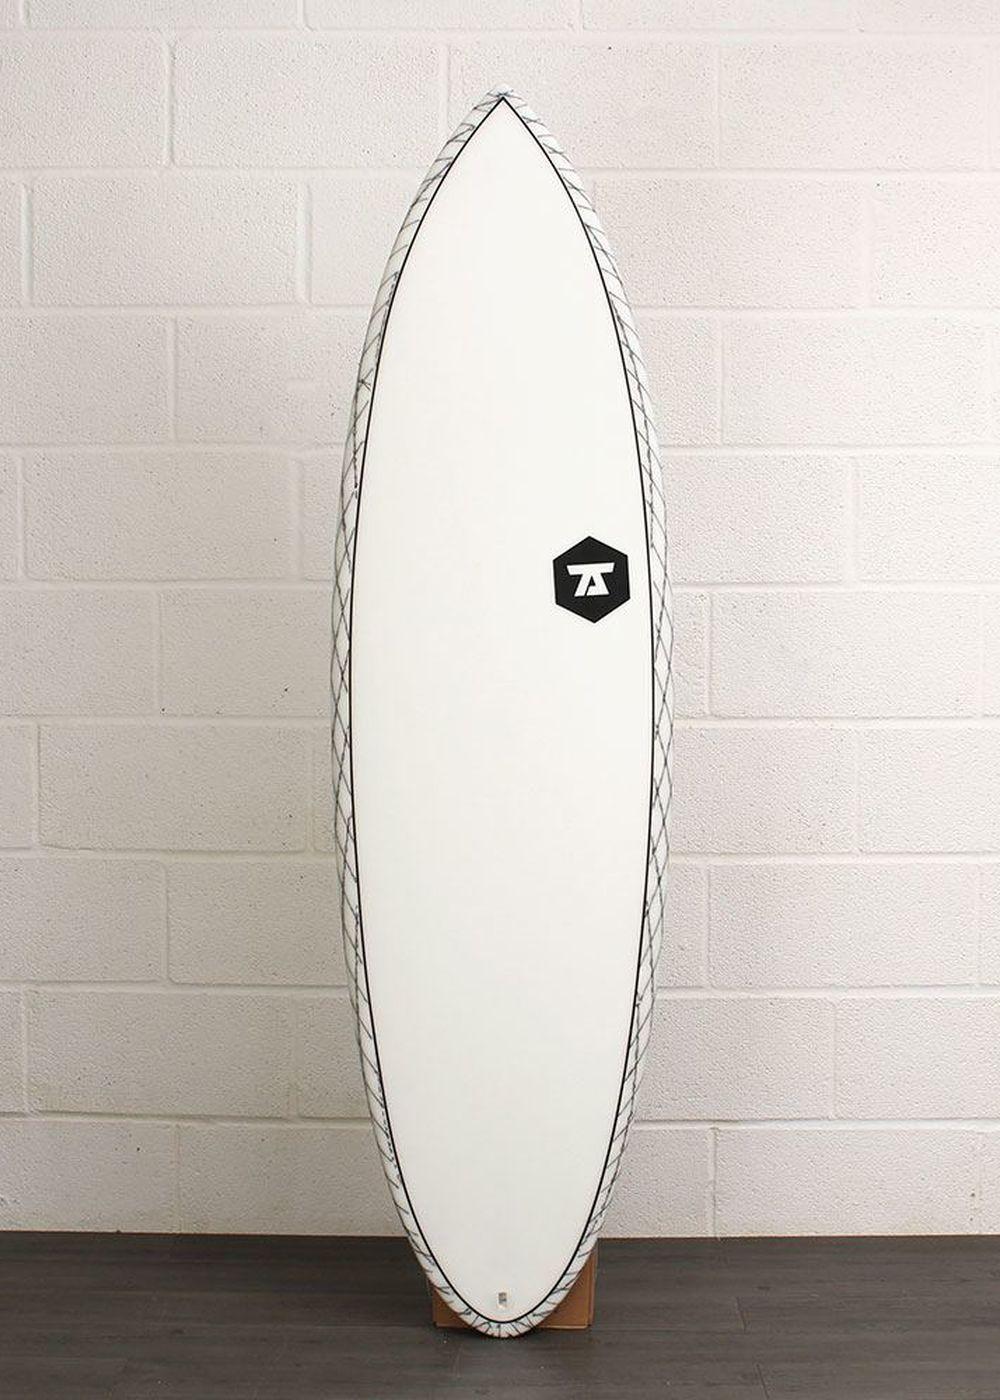 7S SLIPSTREAM CV SURFBOARD 6ft 1 Clear